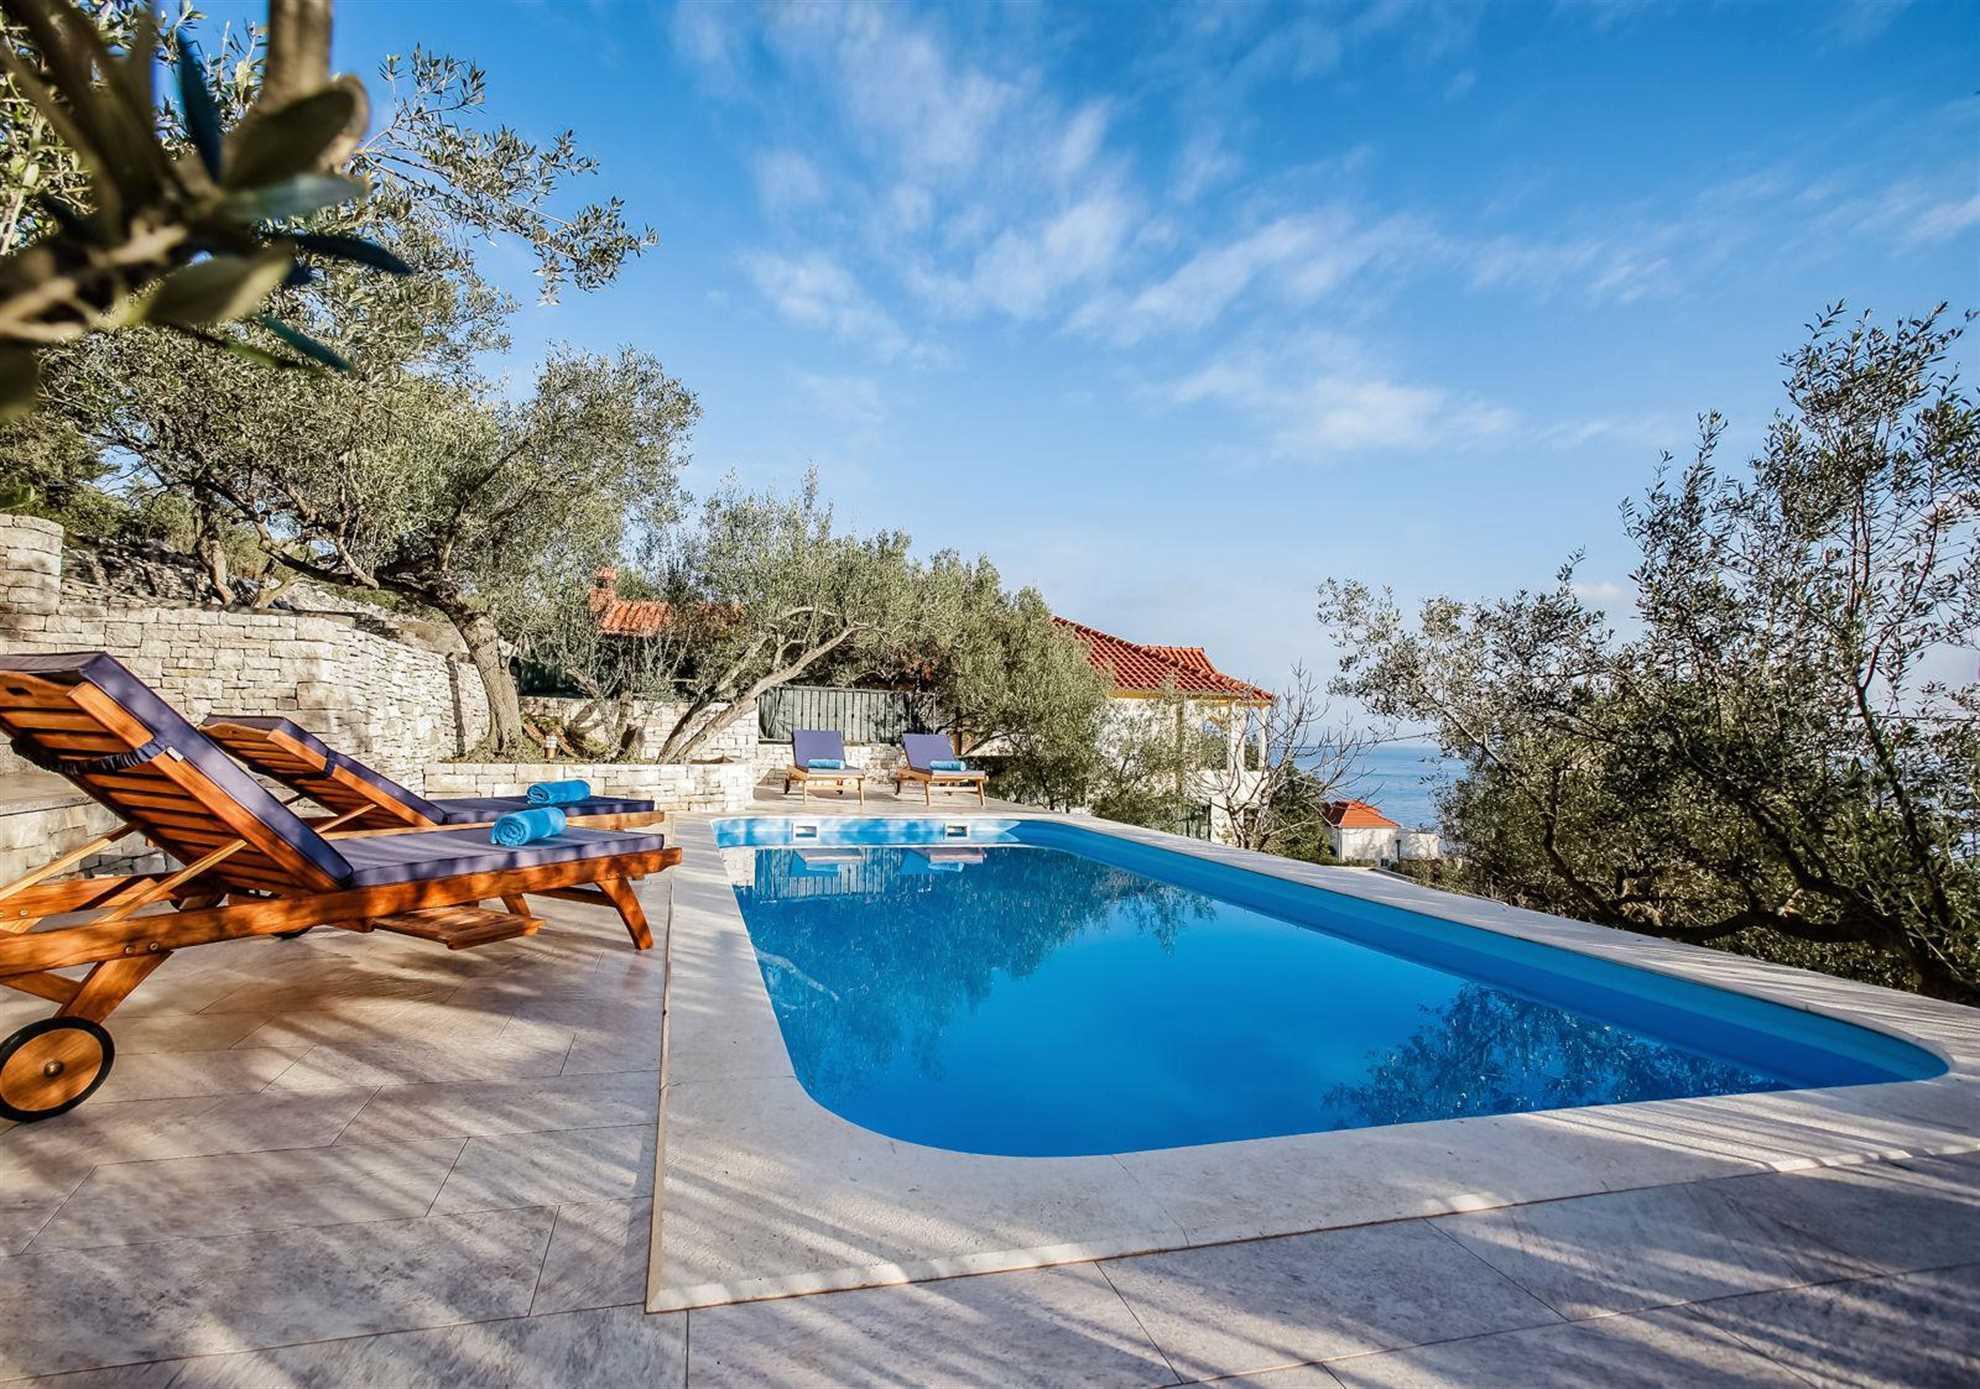 Luxury Villa Golden Beach  with Swimming Pool and Large Sun Deck in Bol on Brac Island